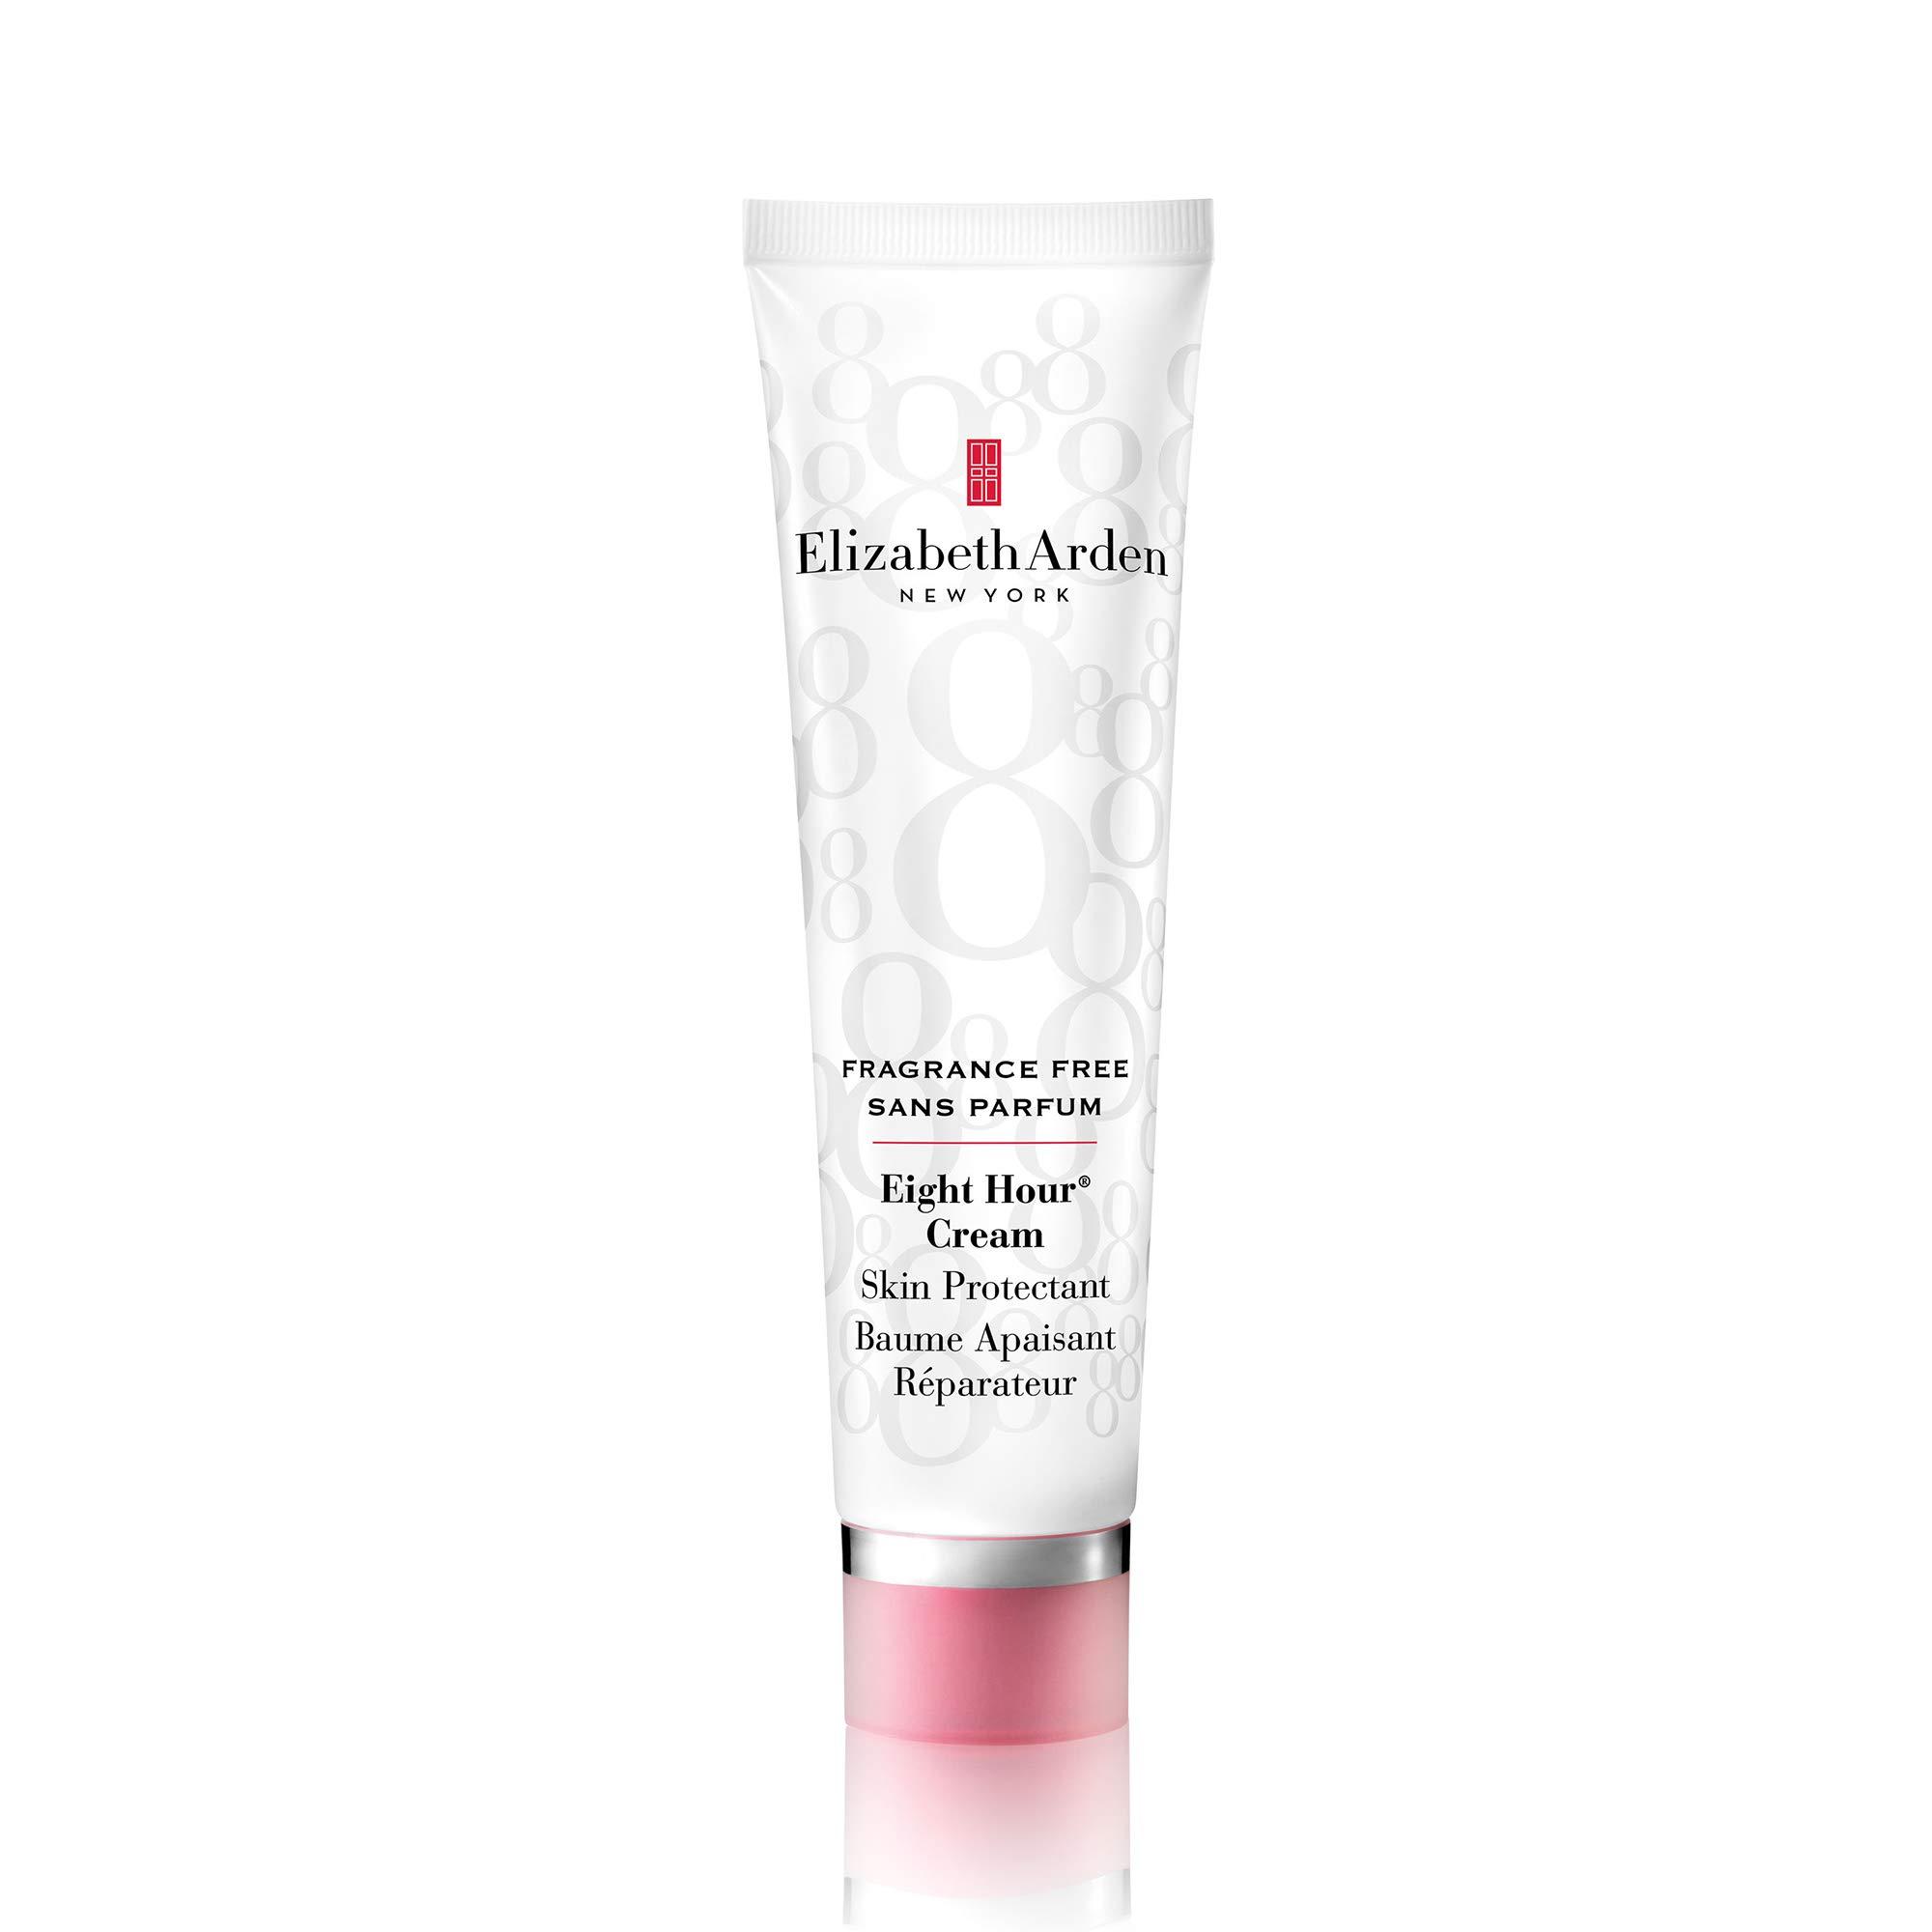 Elizabeth Arden Eight Hour Skin Protectant Cream, Fragrance Free, 1.7 oz. by Elizabeth Arden (Image #1)